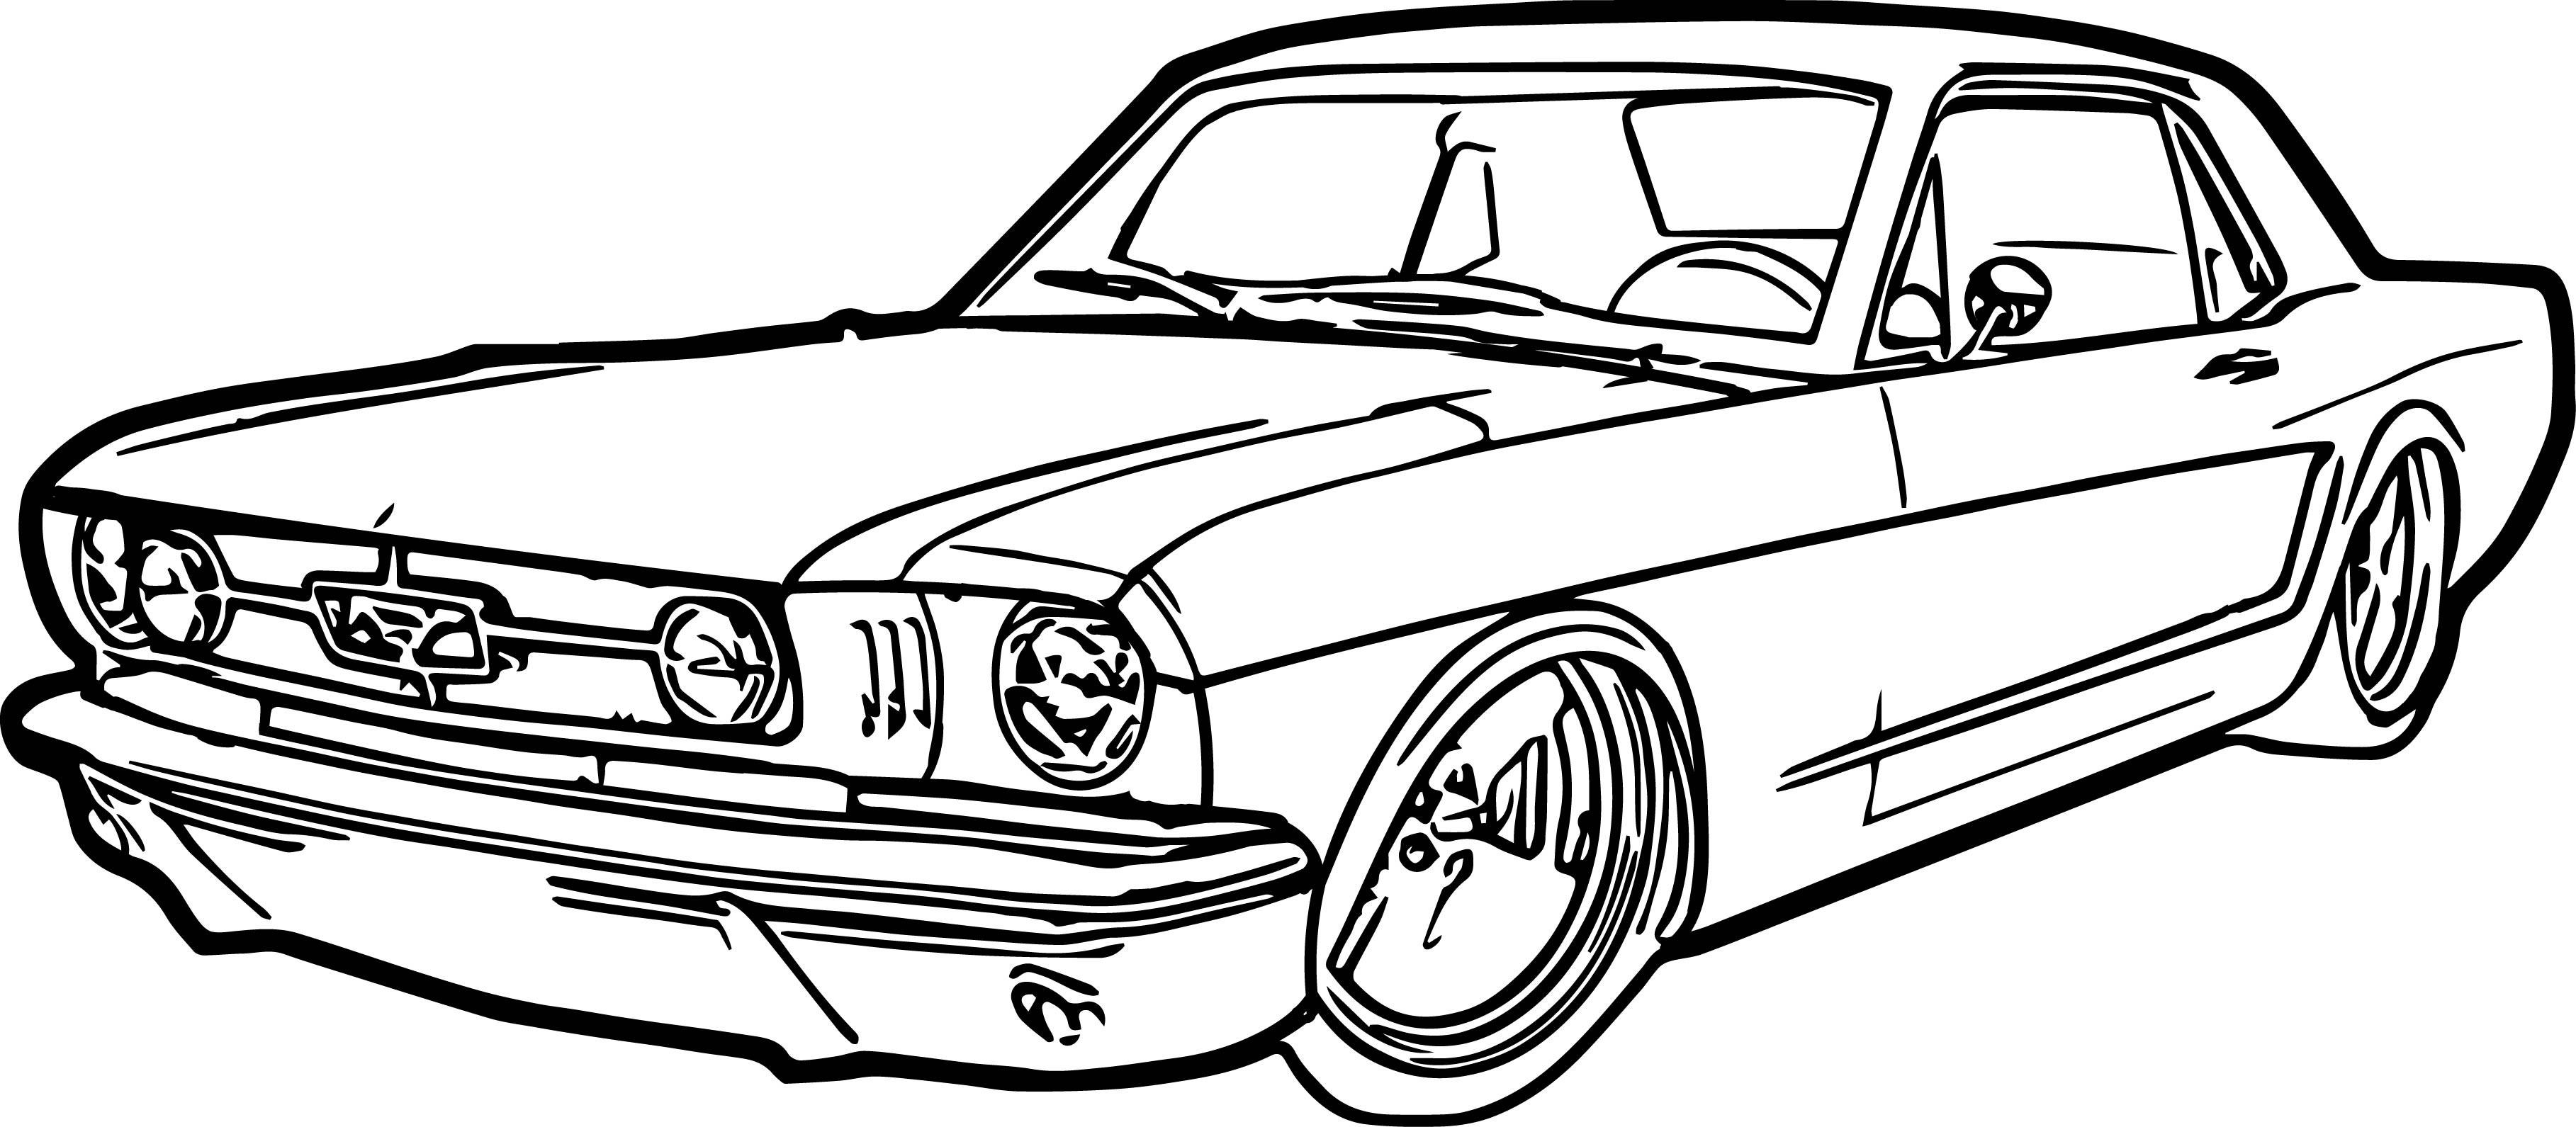 Mustang Car Drawing At Getdrawings Com Free For Personal